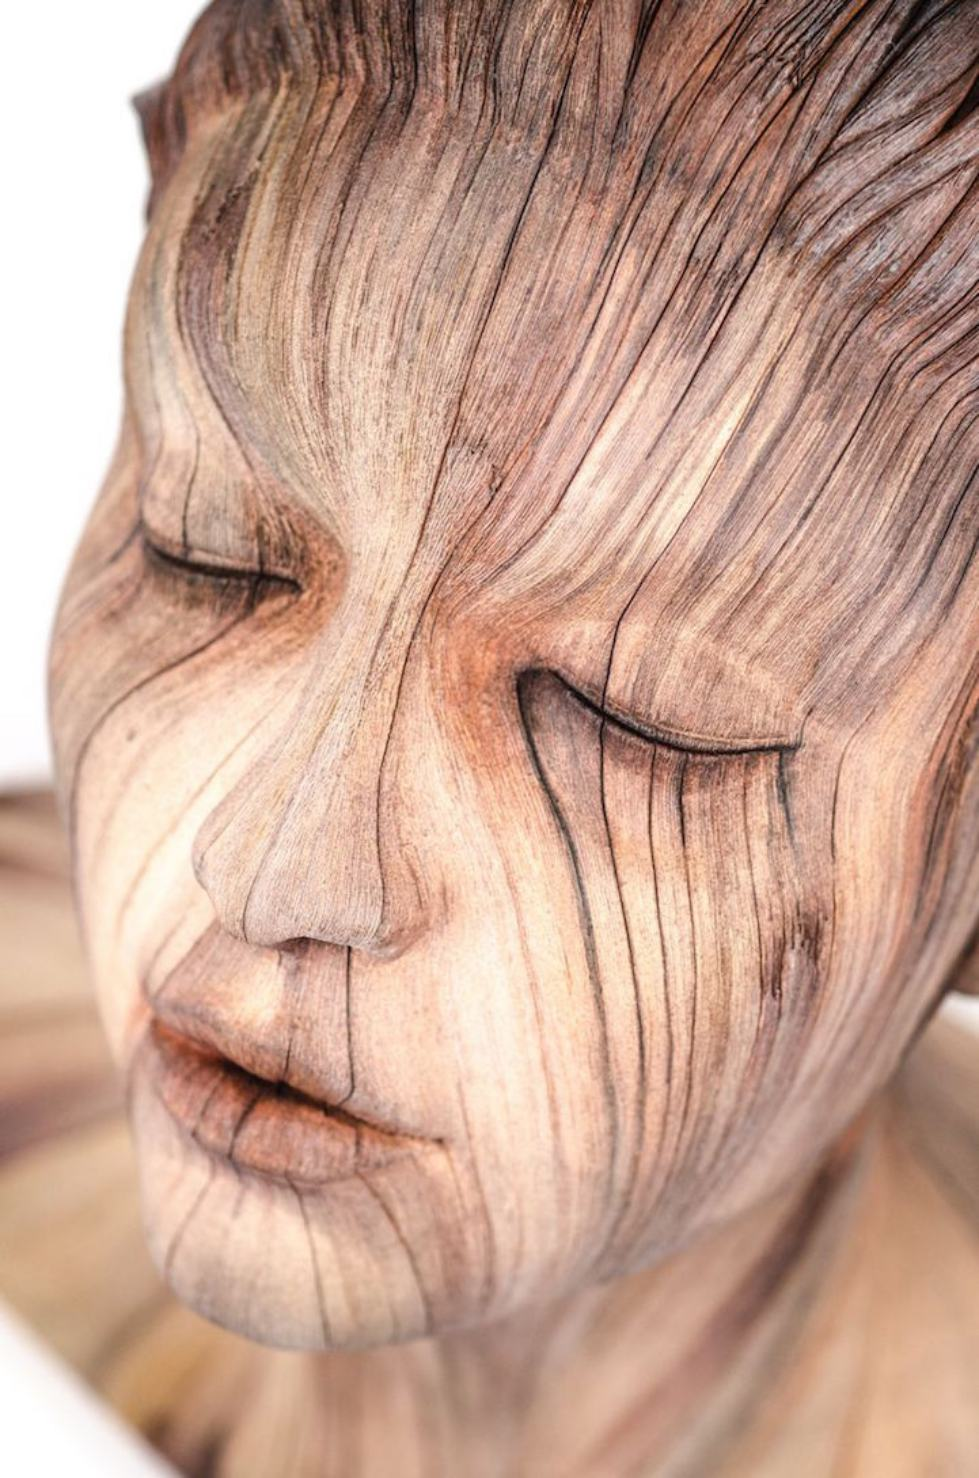 Surreal Ceramics That Look Like Wood